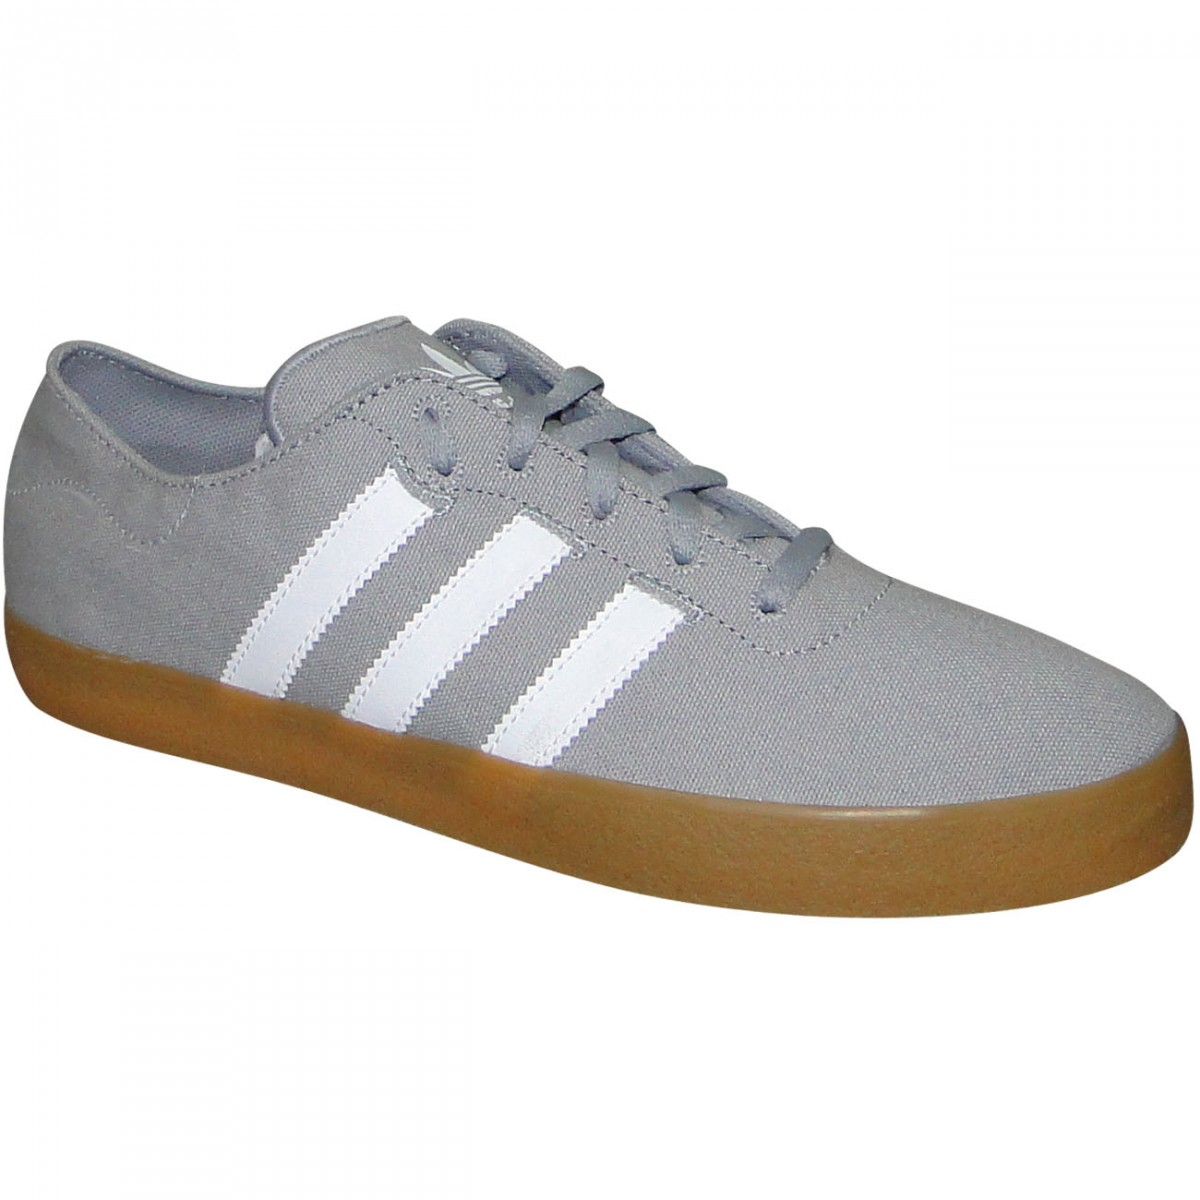 Tenis Adidas Adi Ease Surf G98113 - Cinza Branco - Chuteira Nike ... b70064f9c02b2